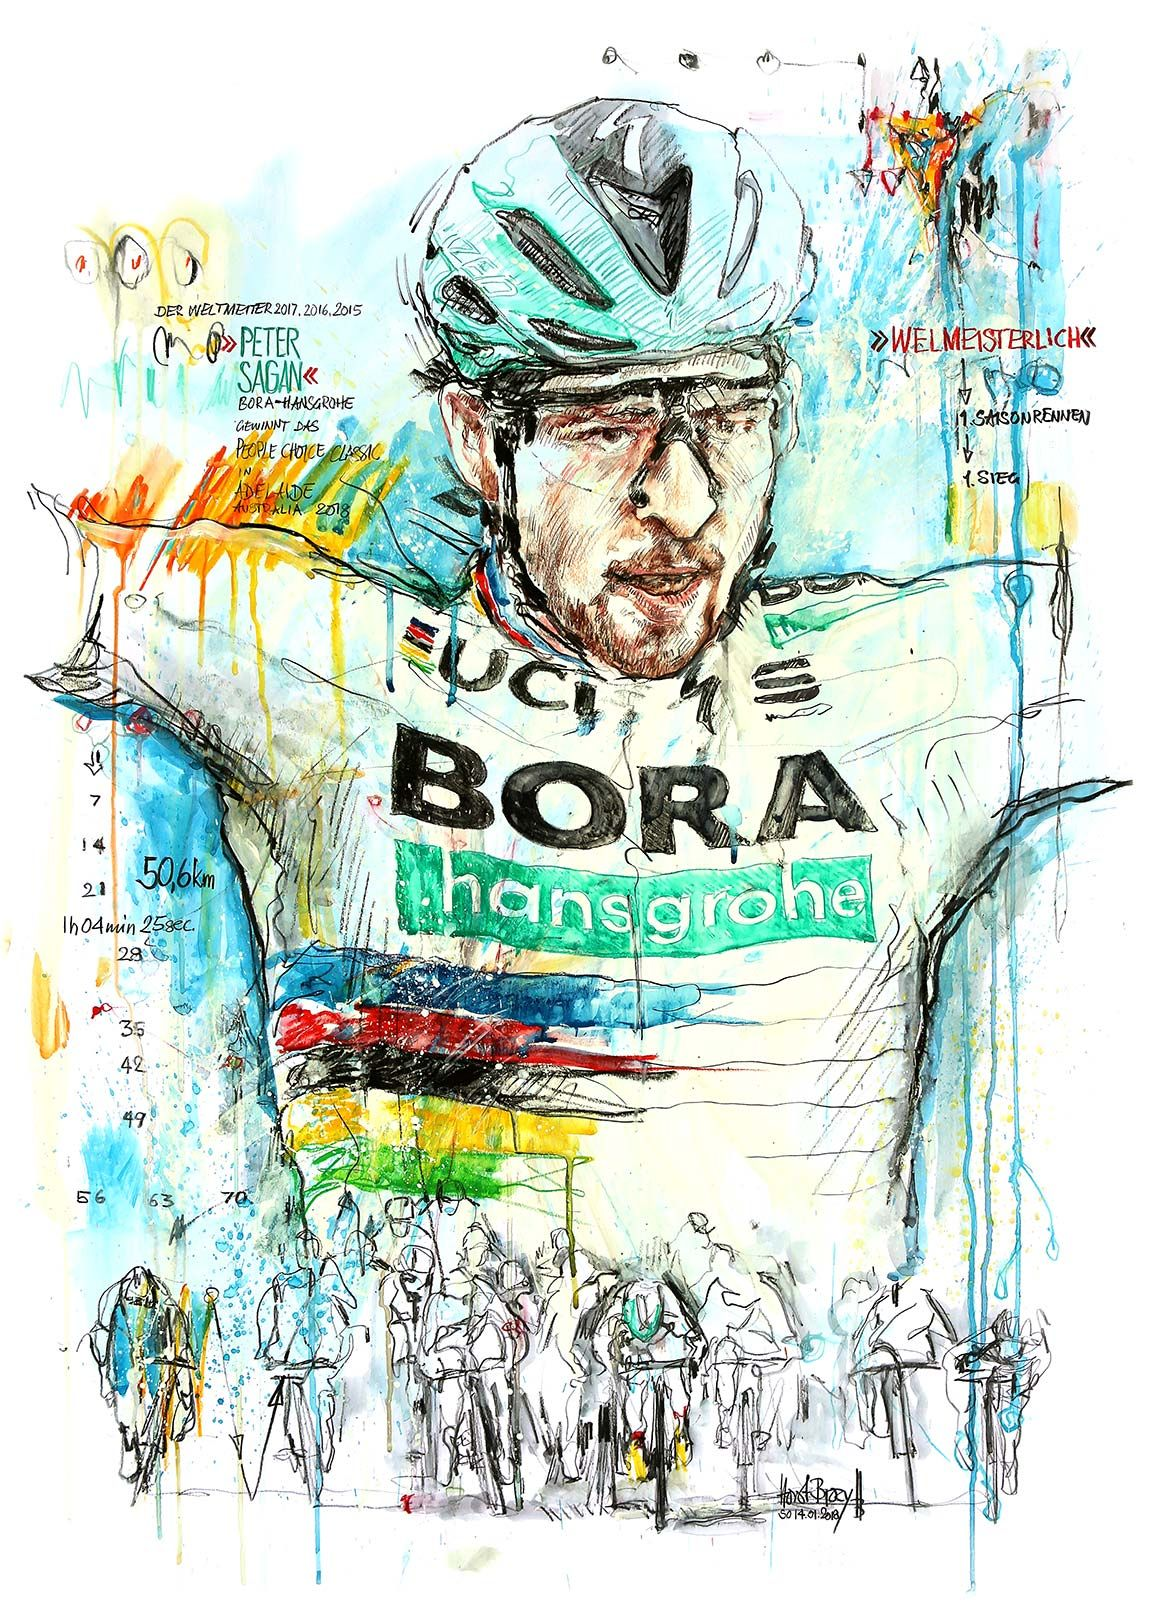 Peter Sagan, BoraHanserohe, gewinnt das People Choice